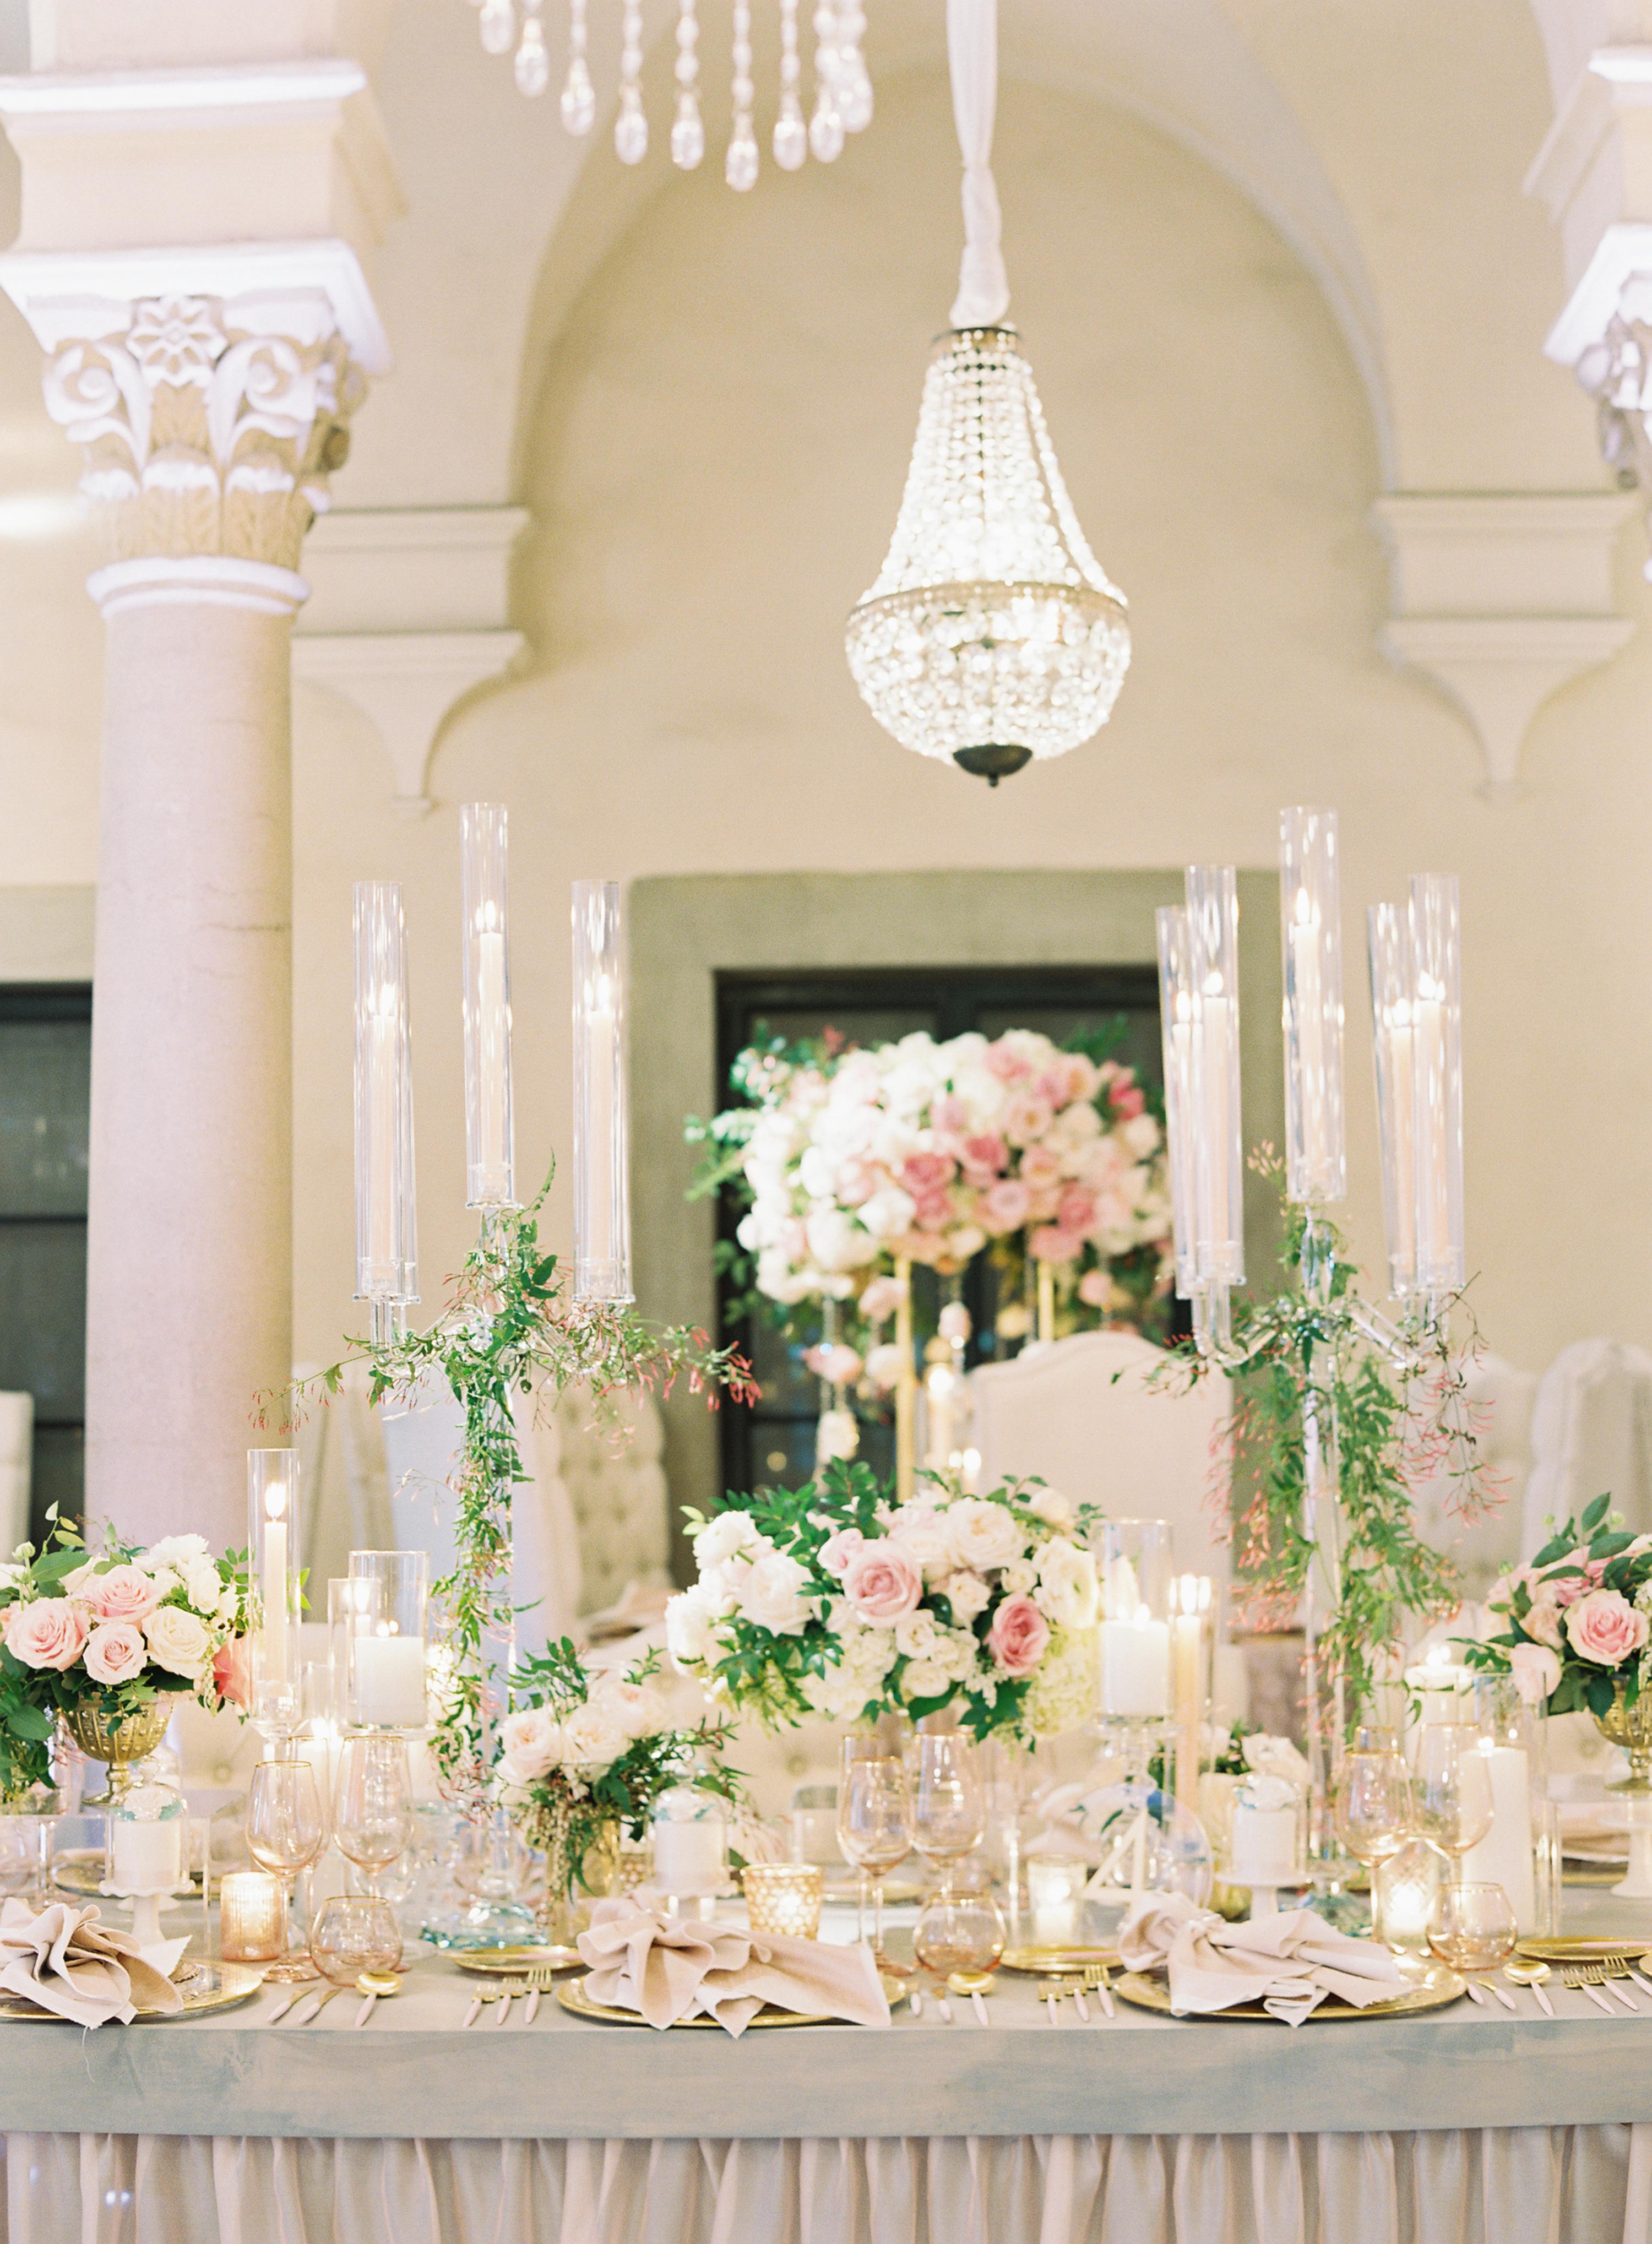 Athenaeum_Wedding_Hi_Res-86-Jen_Huang-005198-R1-014